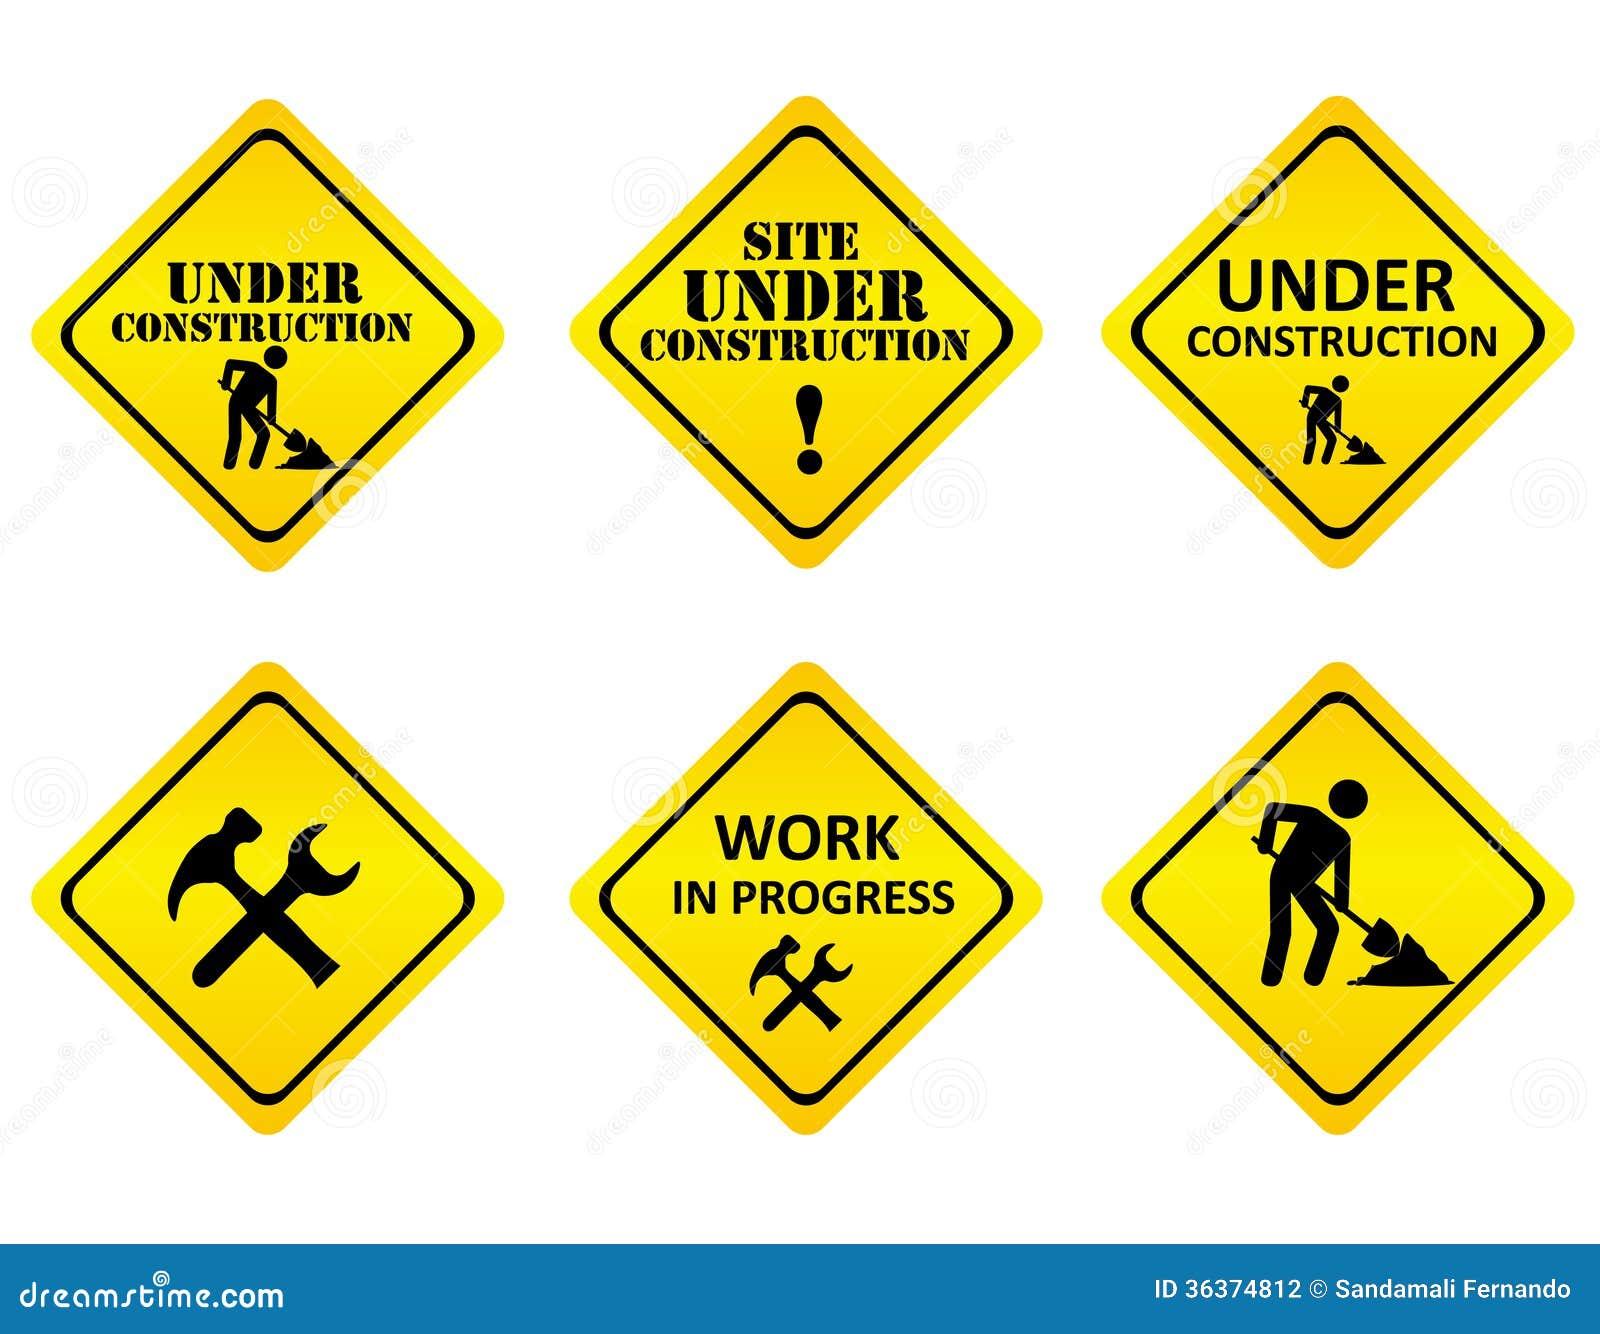 Construction Sign Clipart Construction Sign clipart